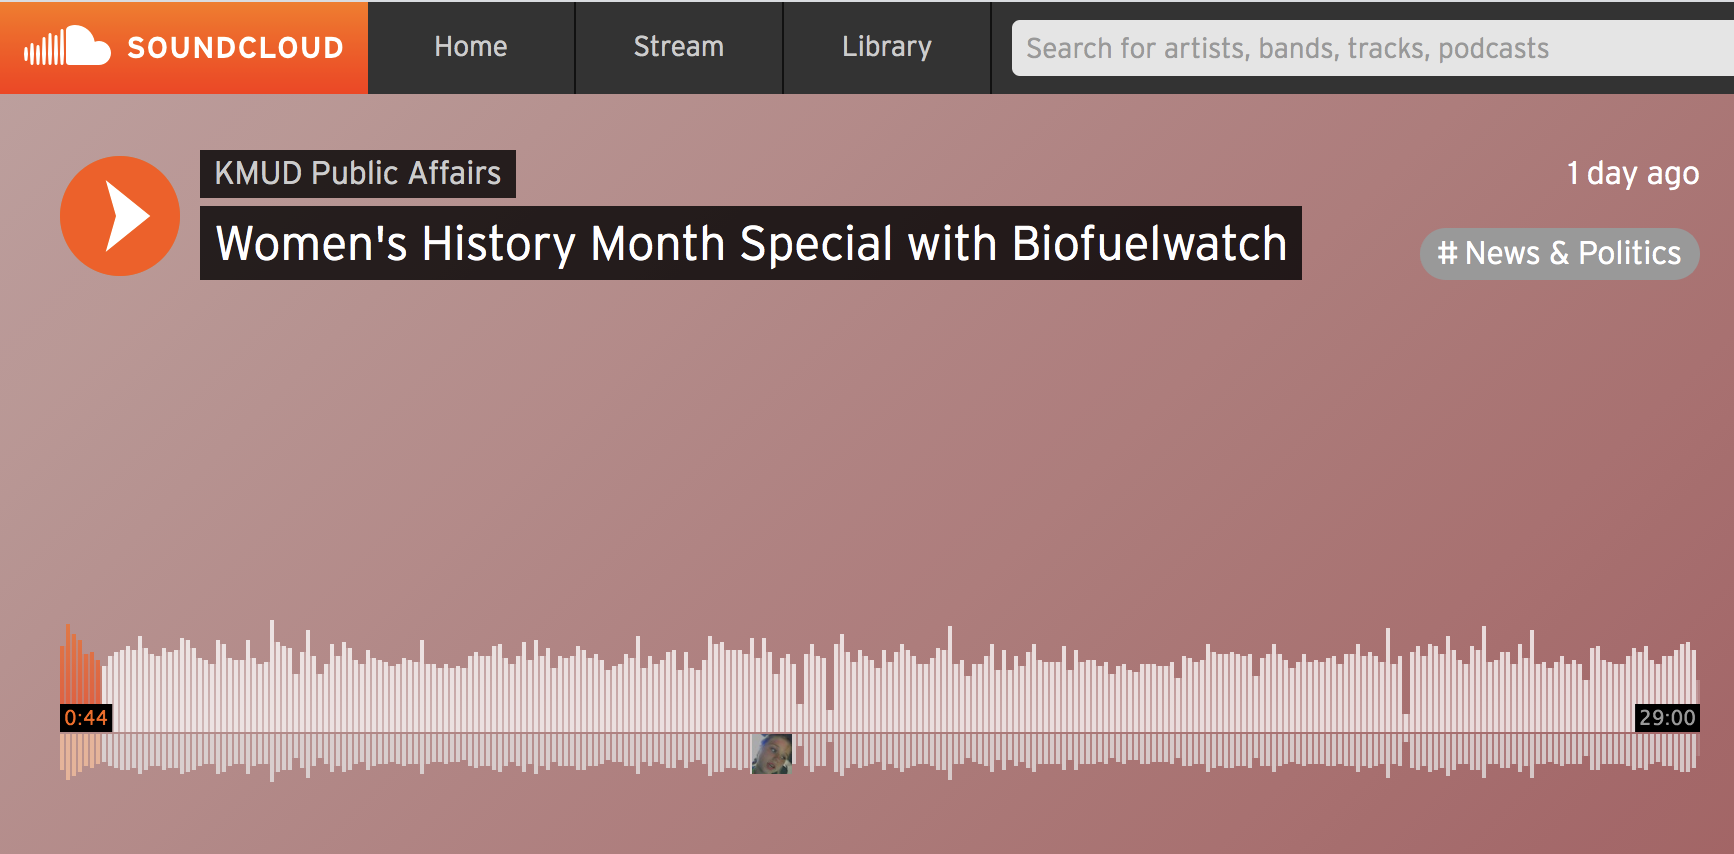 SoundCloud player of BCAction's KMUD interview